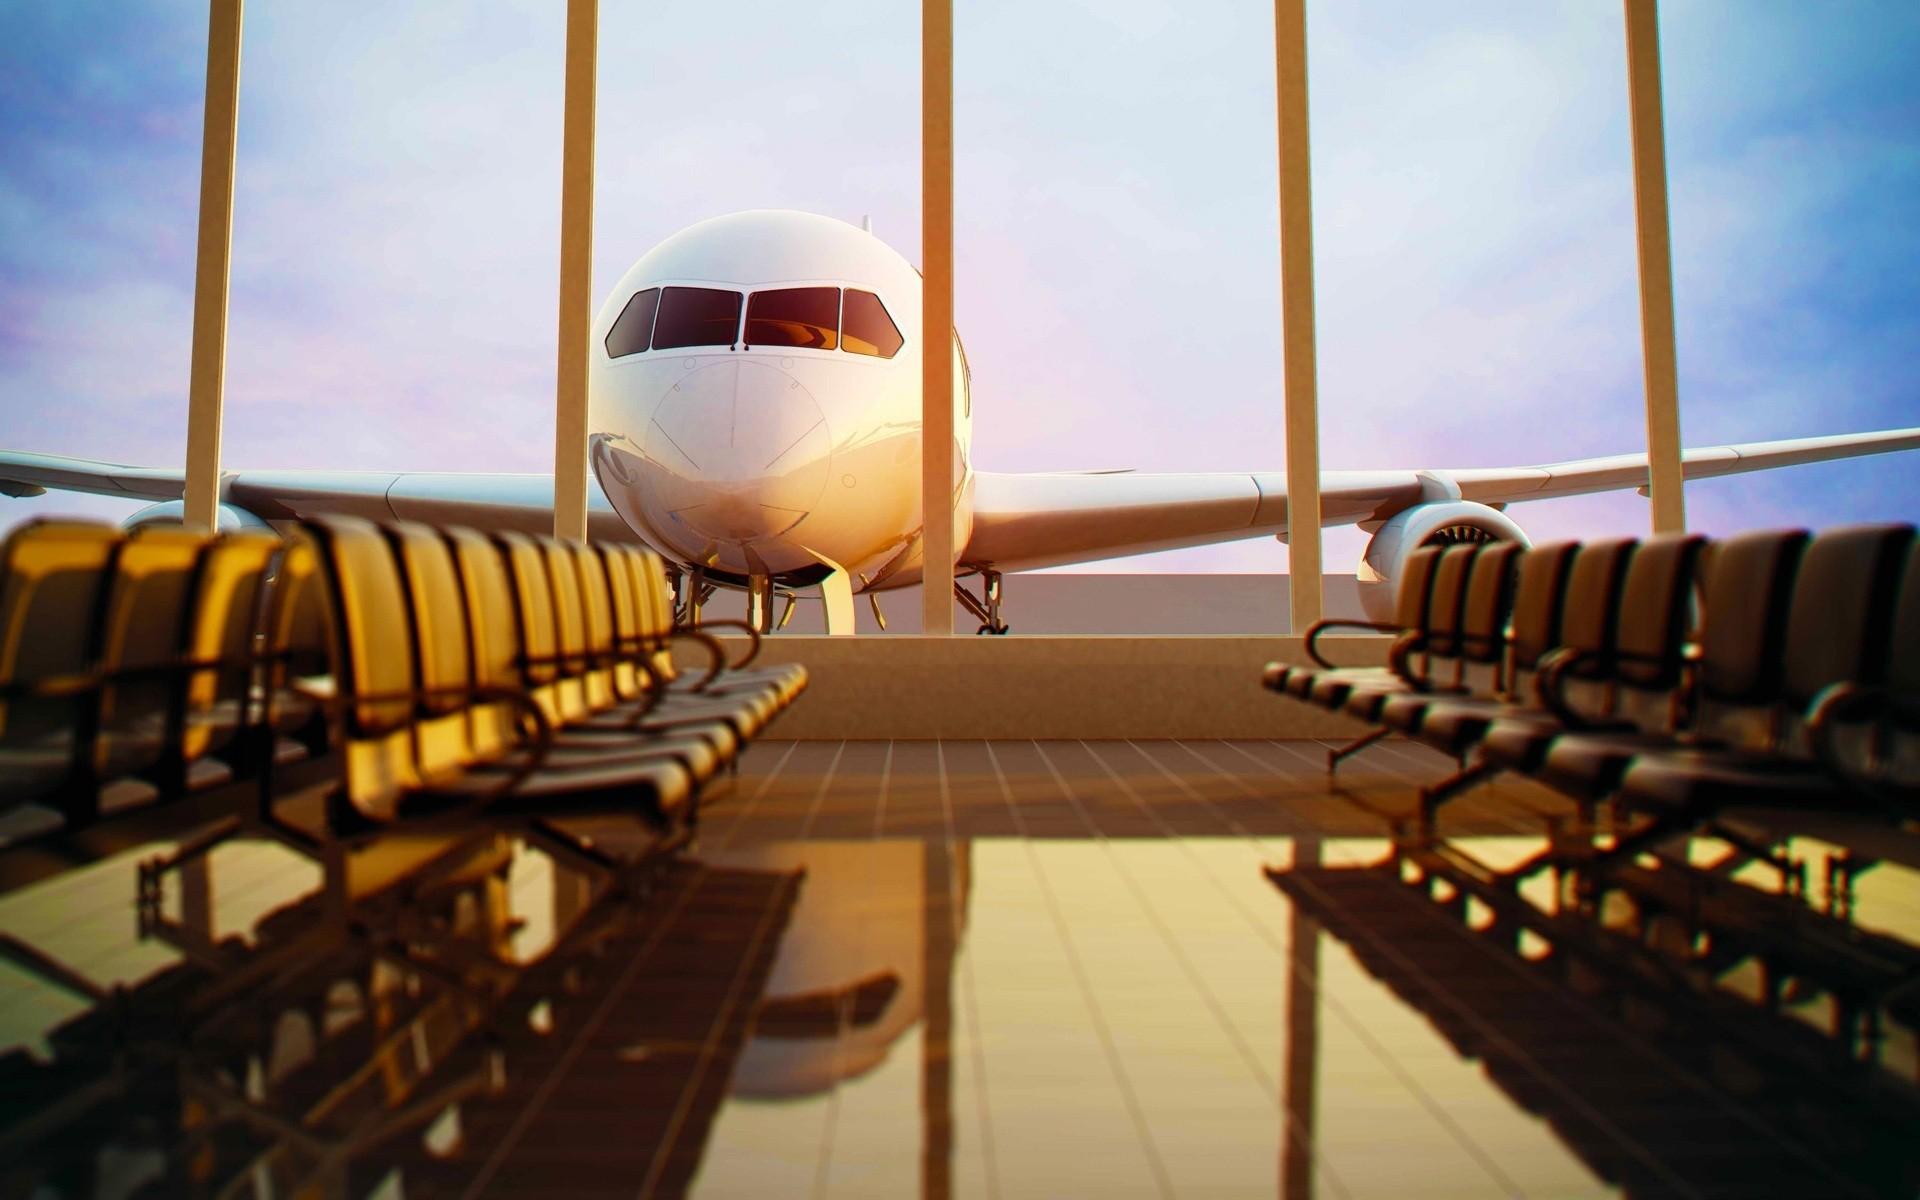 Дешевые авиабилеты Москва - Ереван Цены от 29